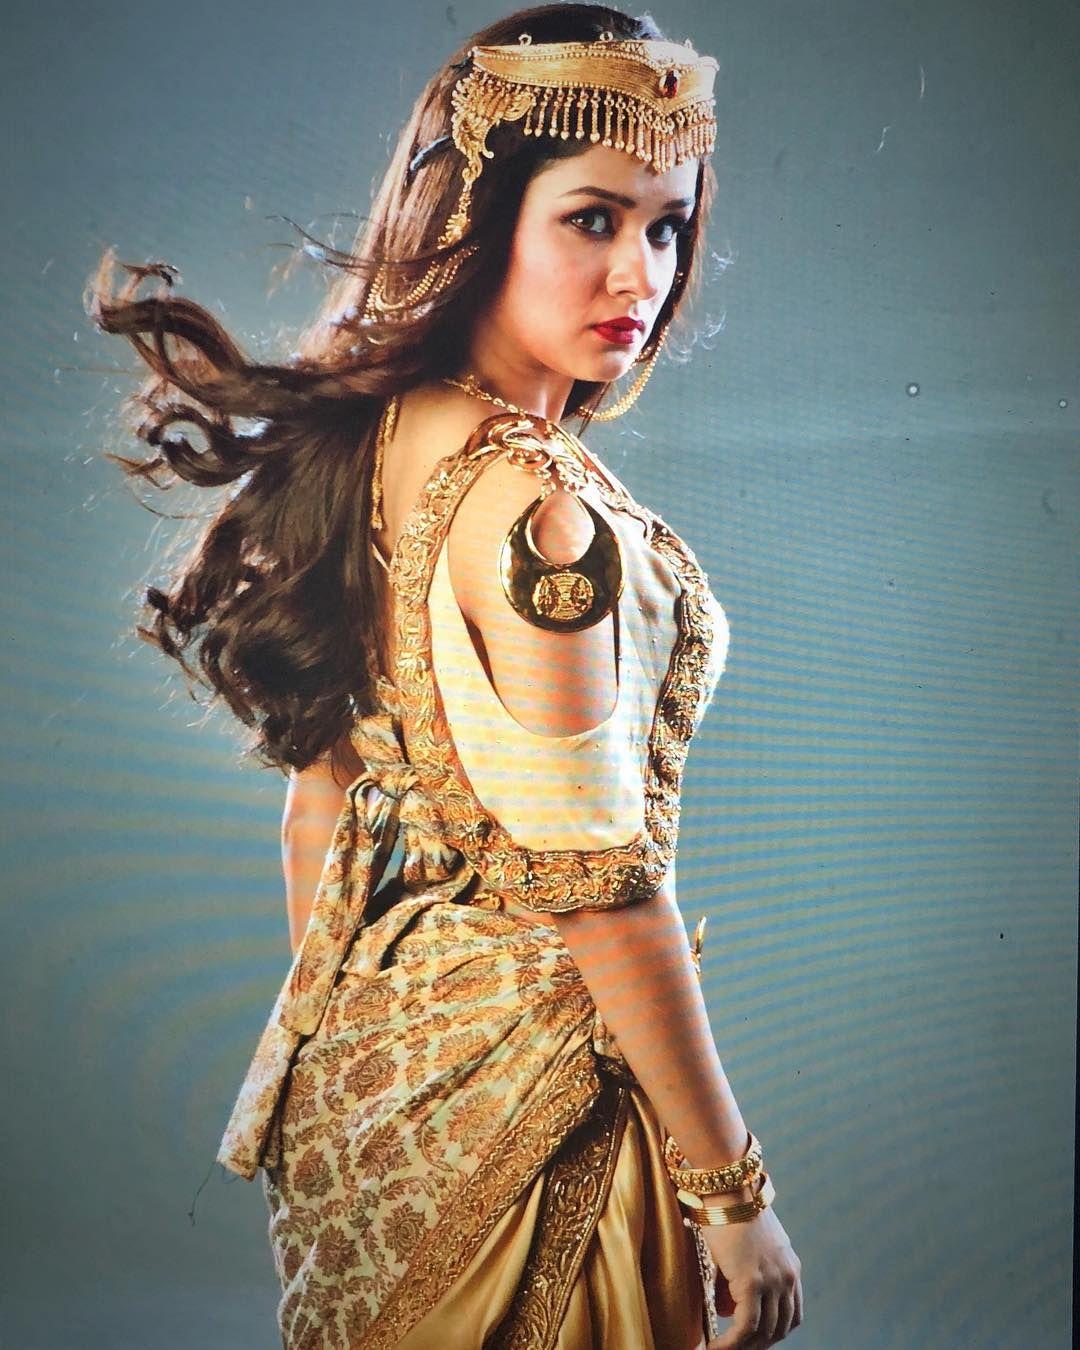 Do watch Aladdin Naam Toh Suna Hoga Mon-Fri 9 pm from today only on